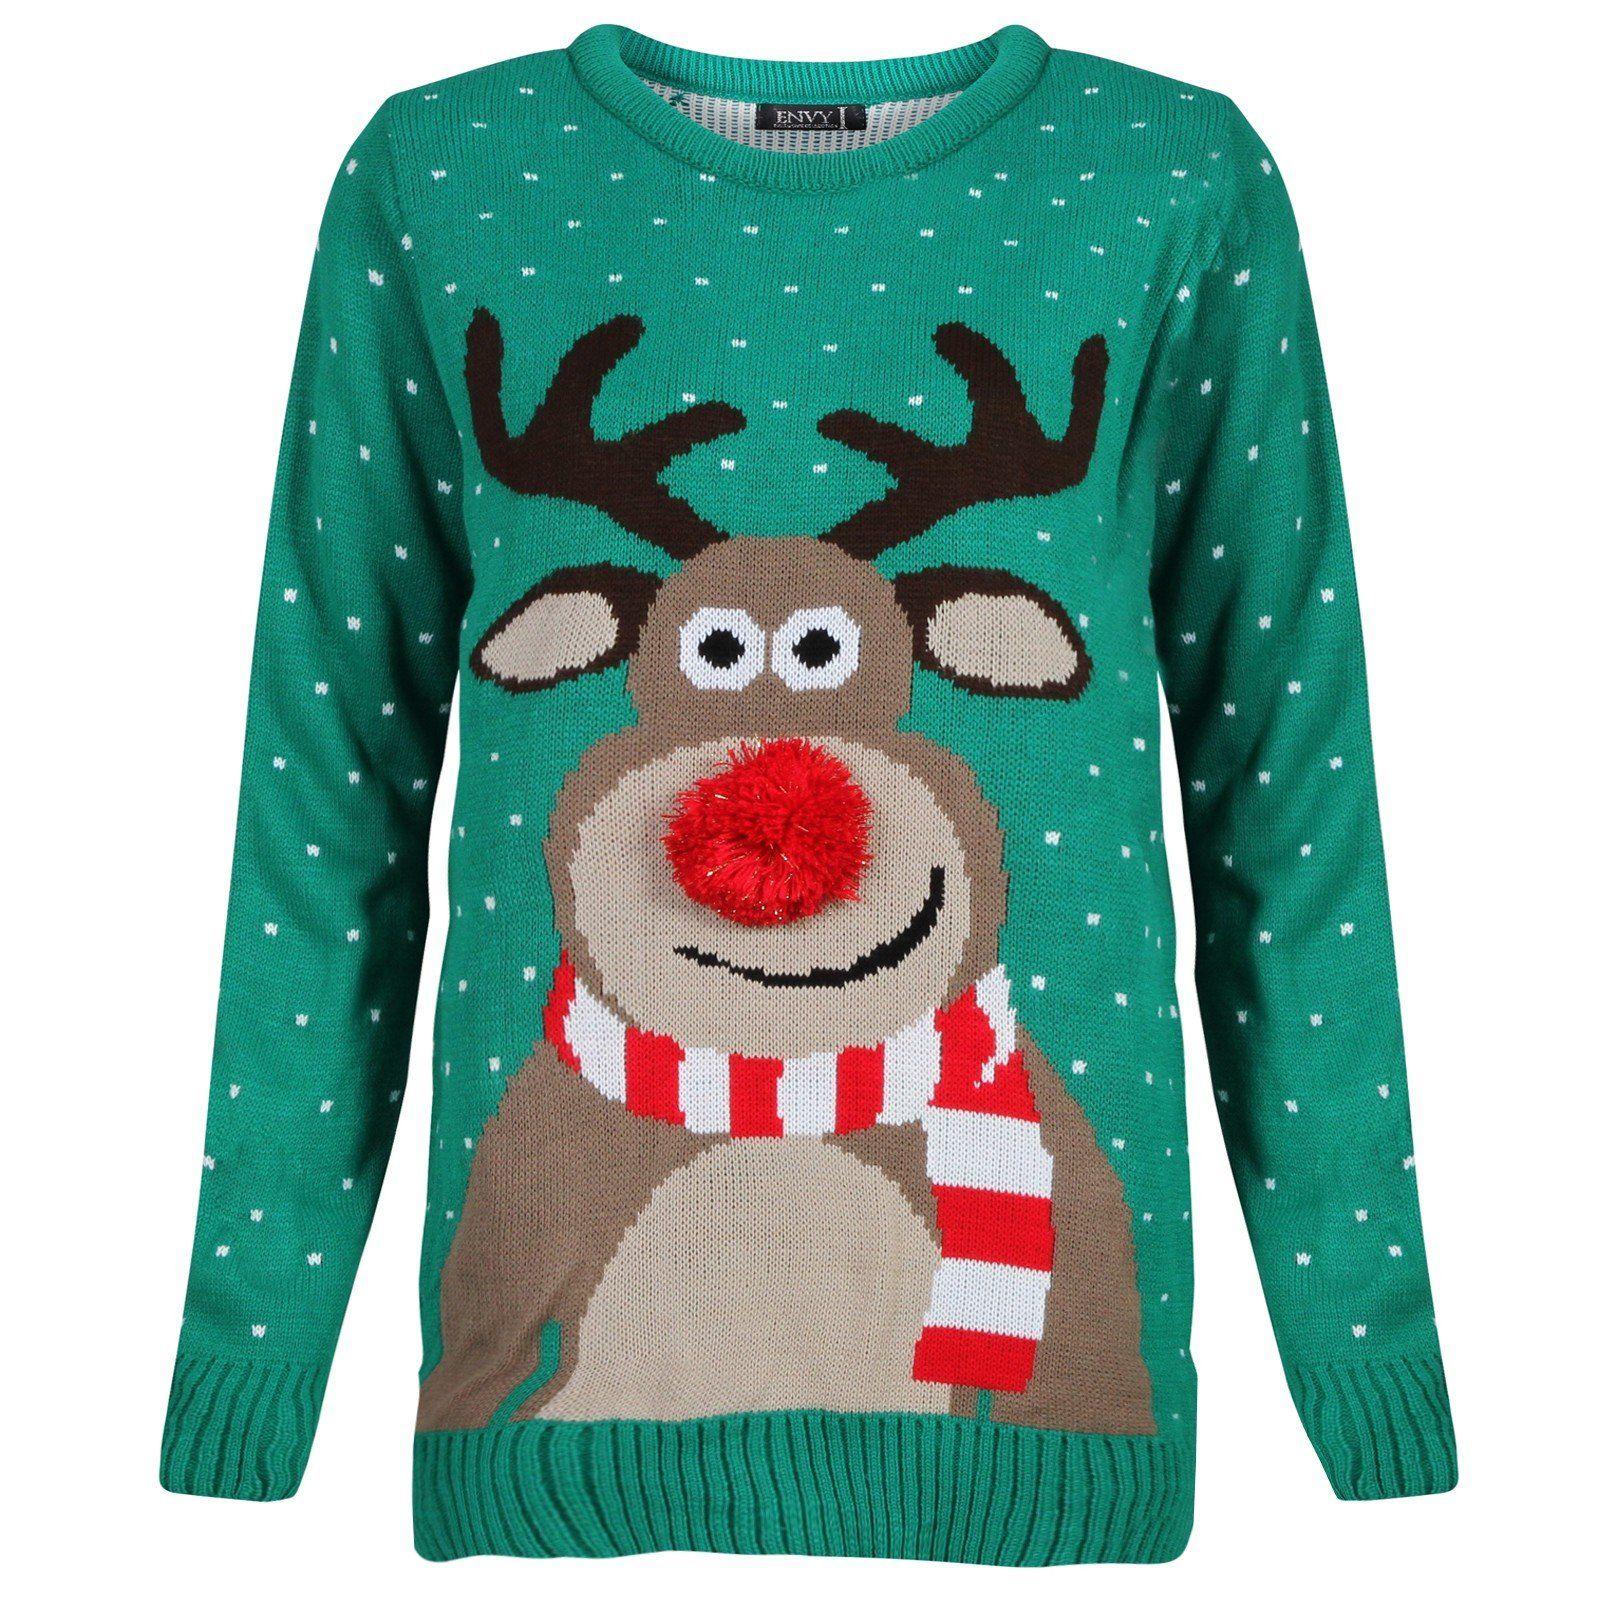 Mens Ladies Novelty Jumper Sweater Retro Christmas Xmas Rudolph ...